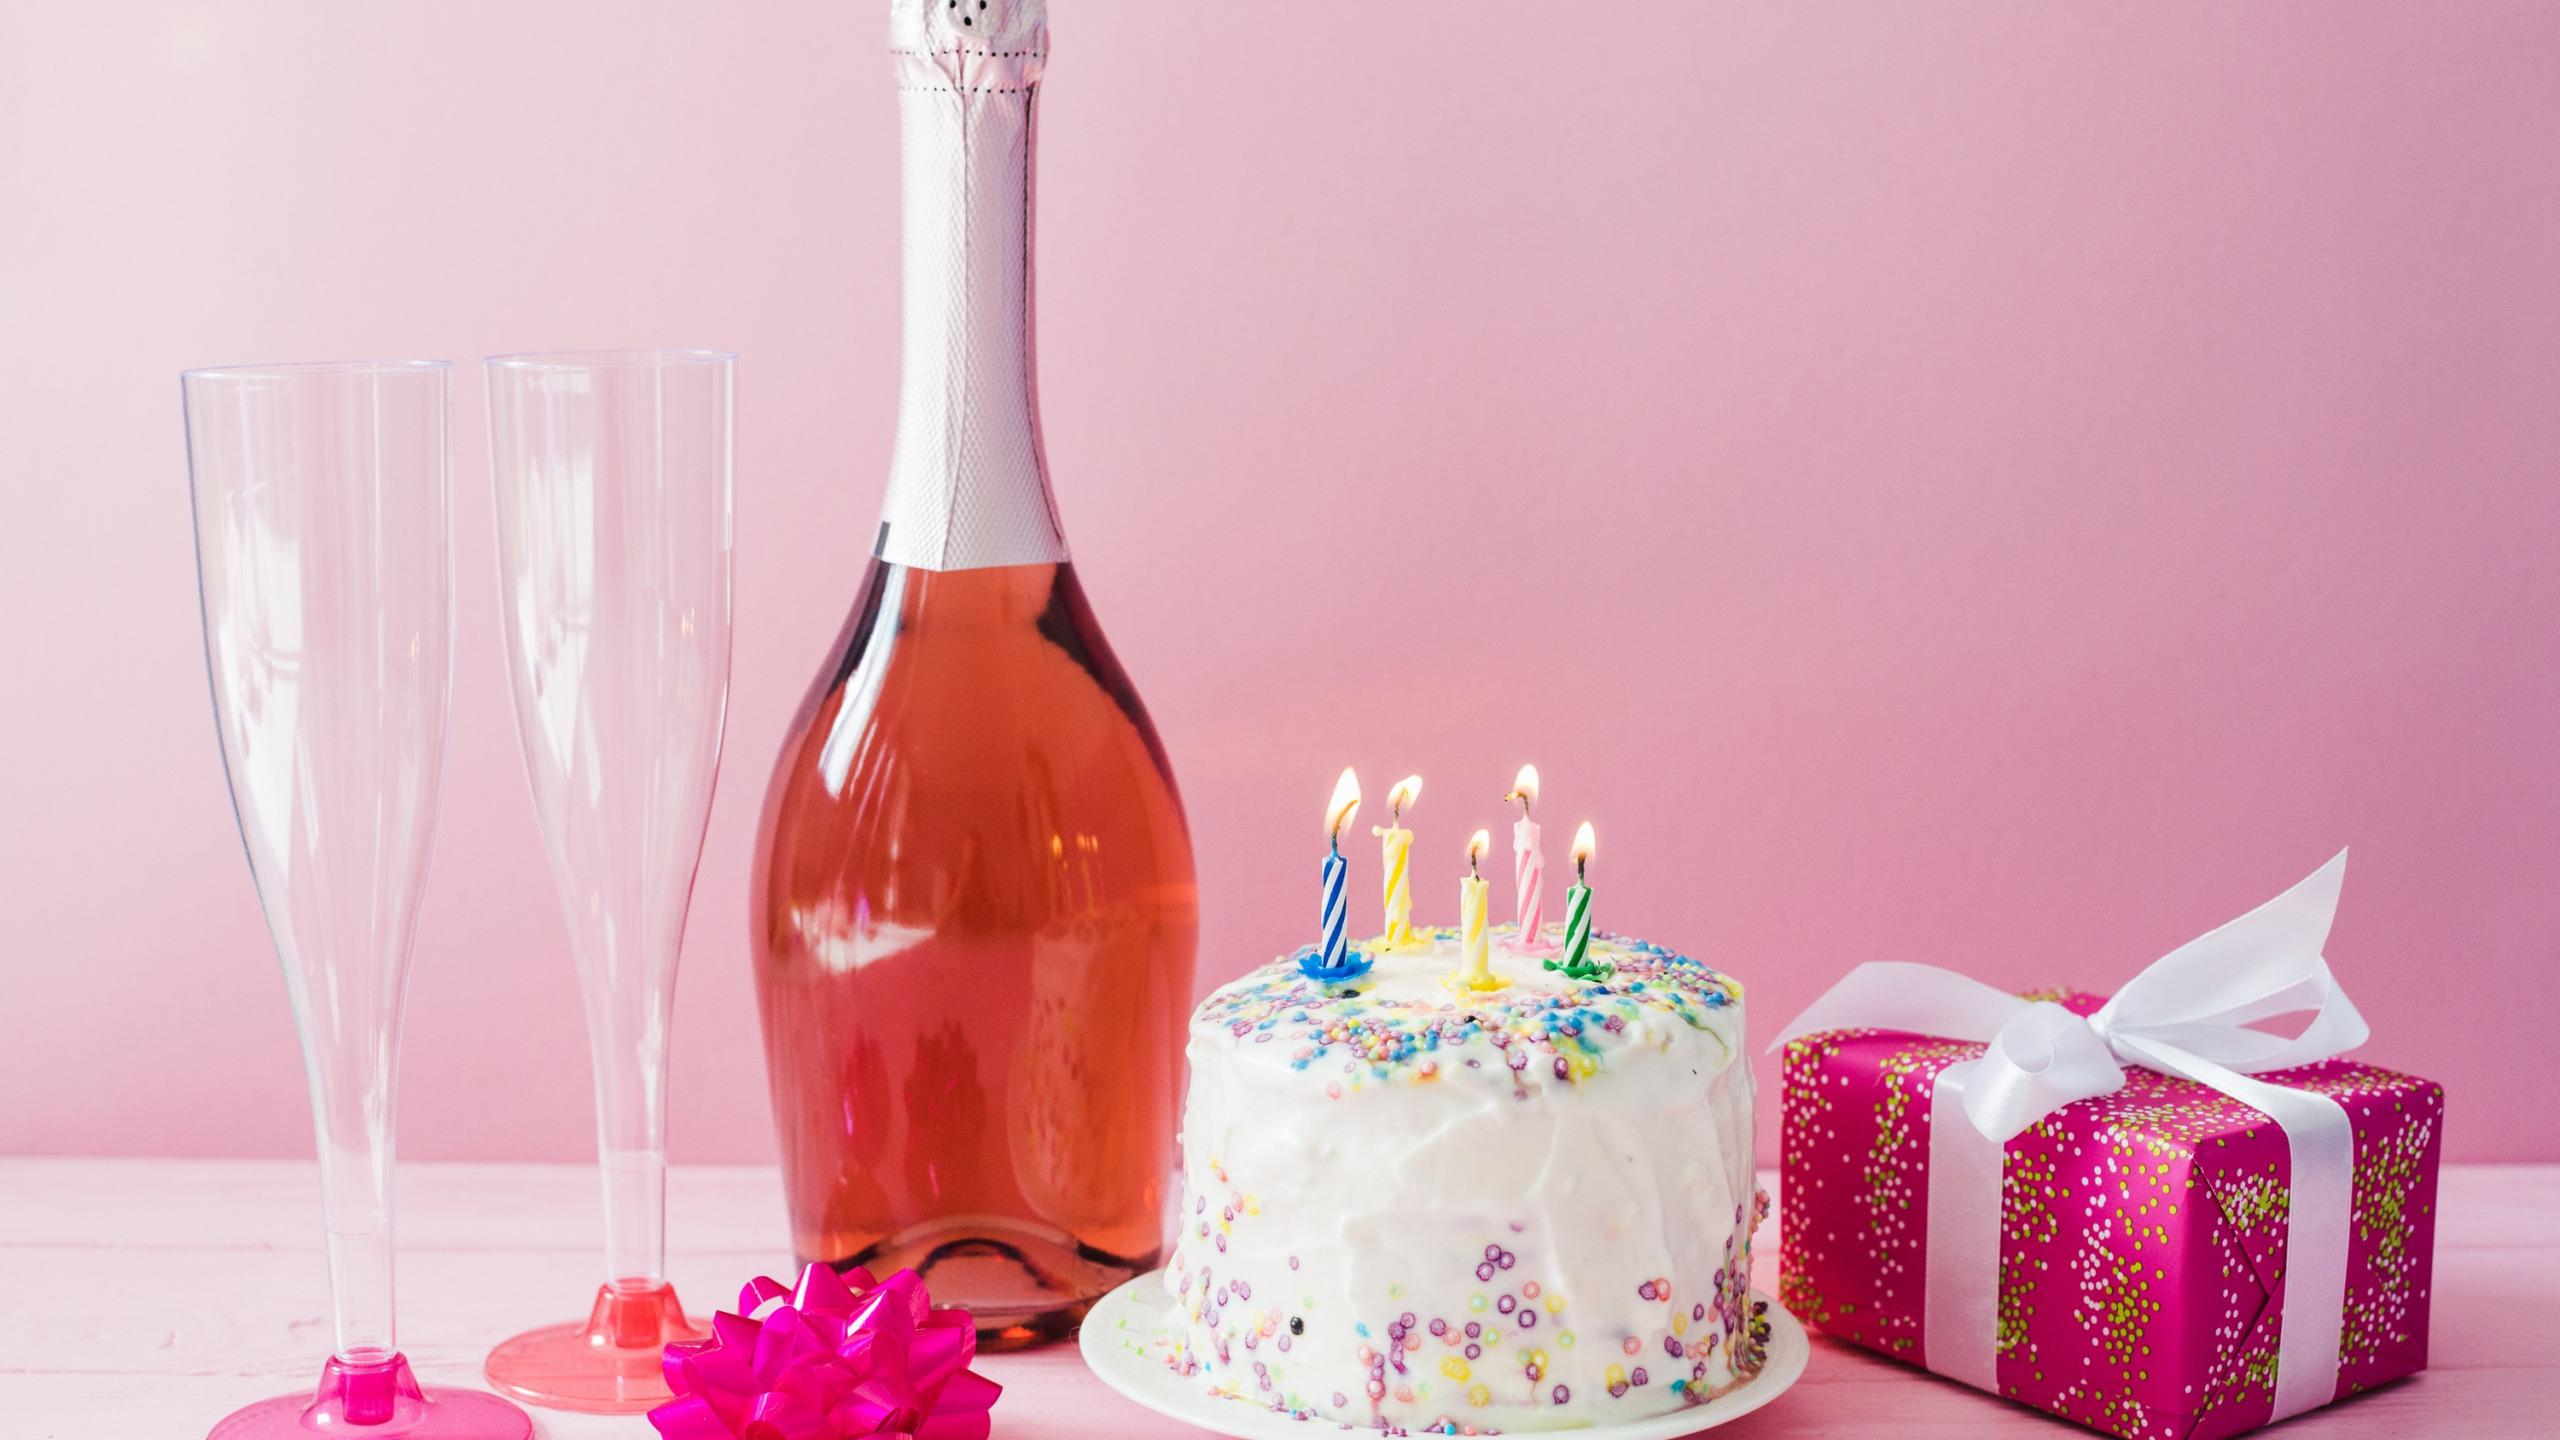 Картинки с шампанским и тортом